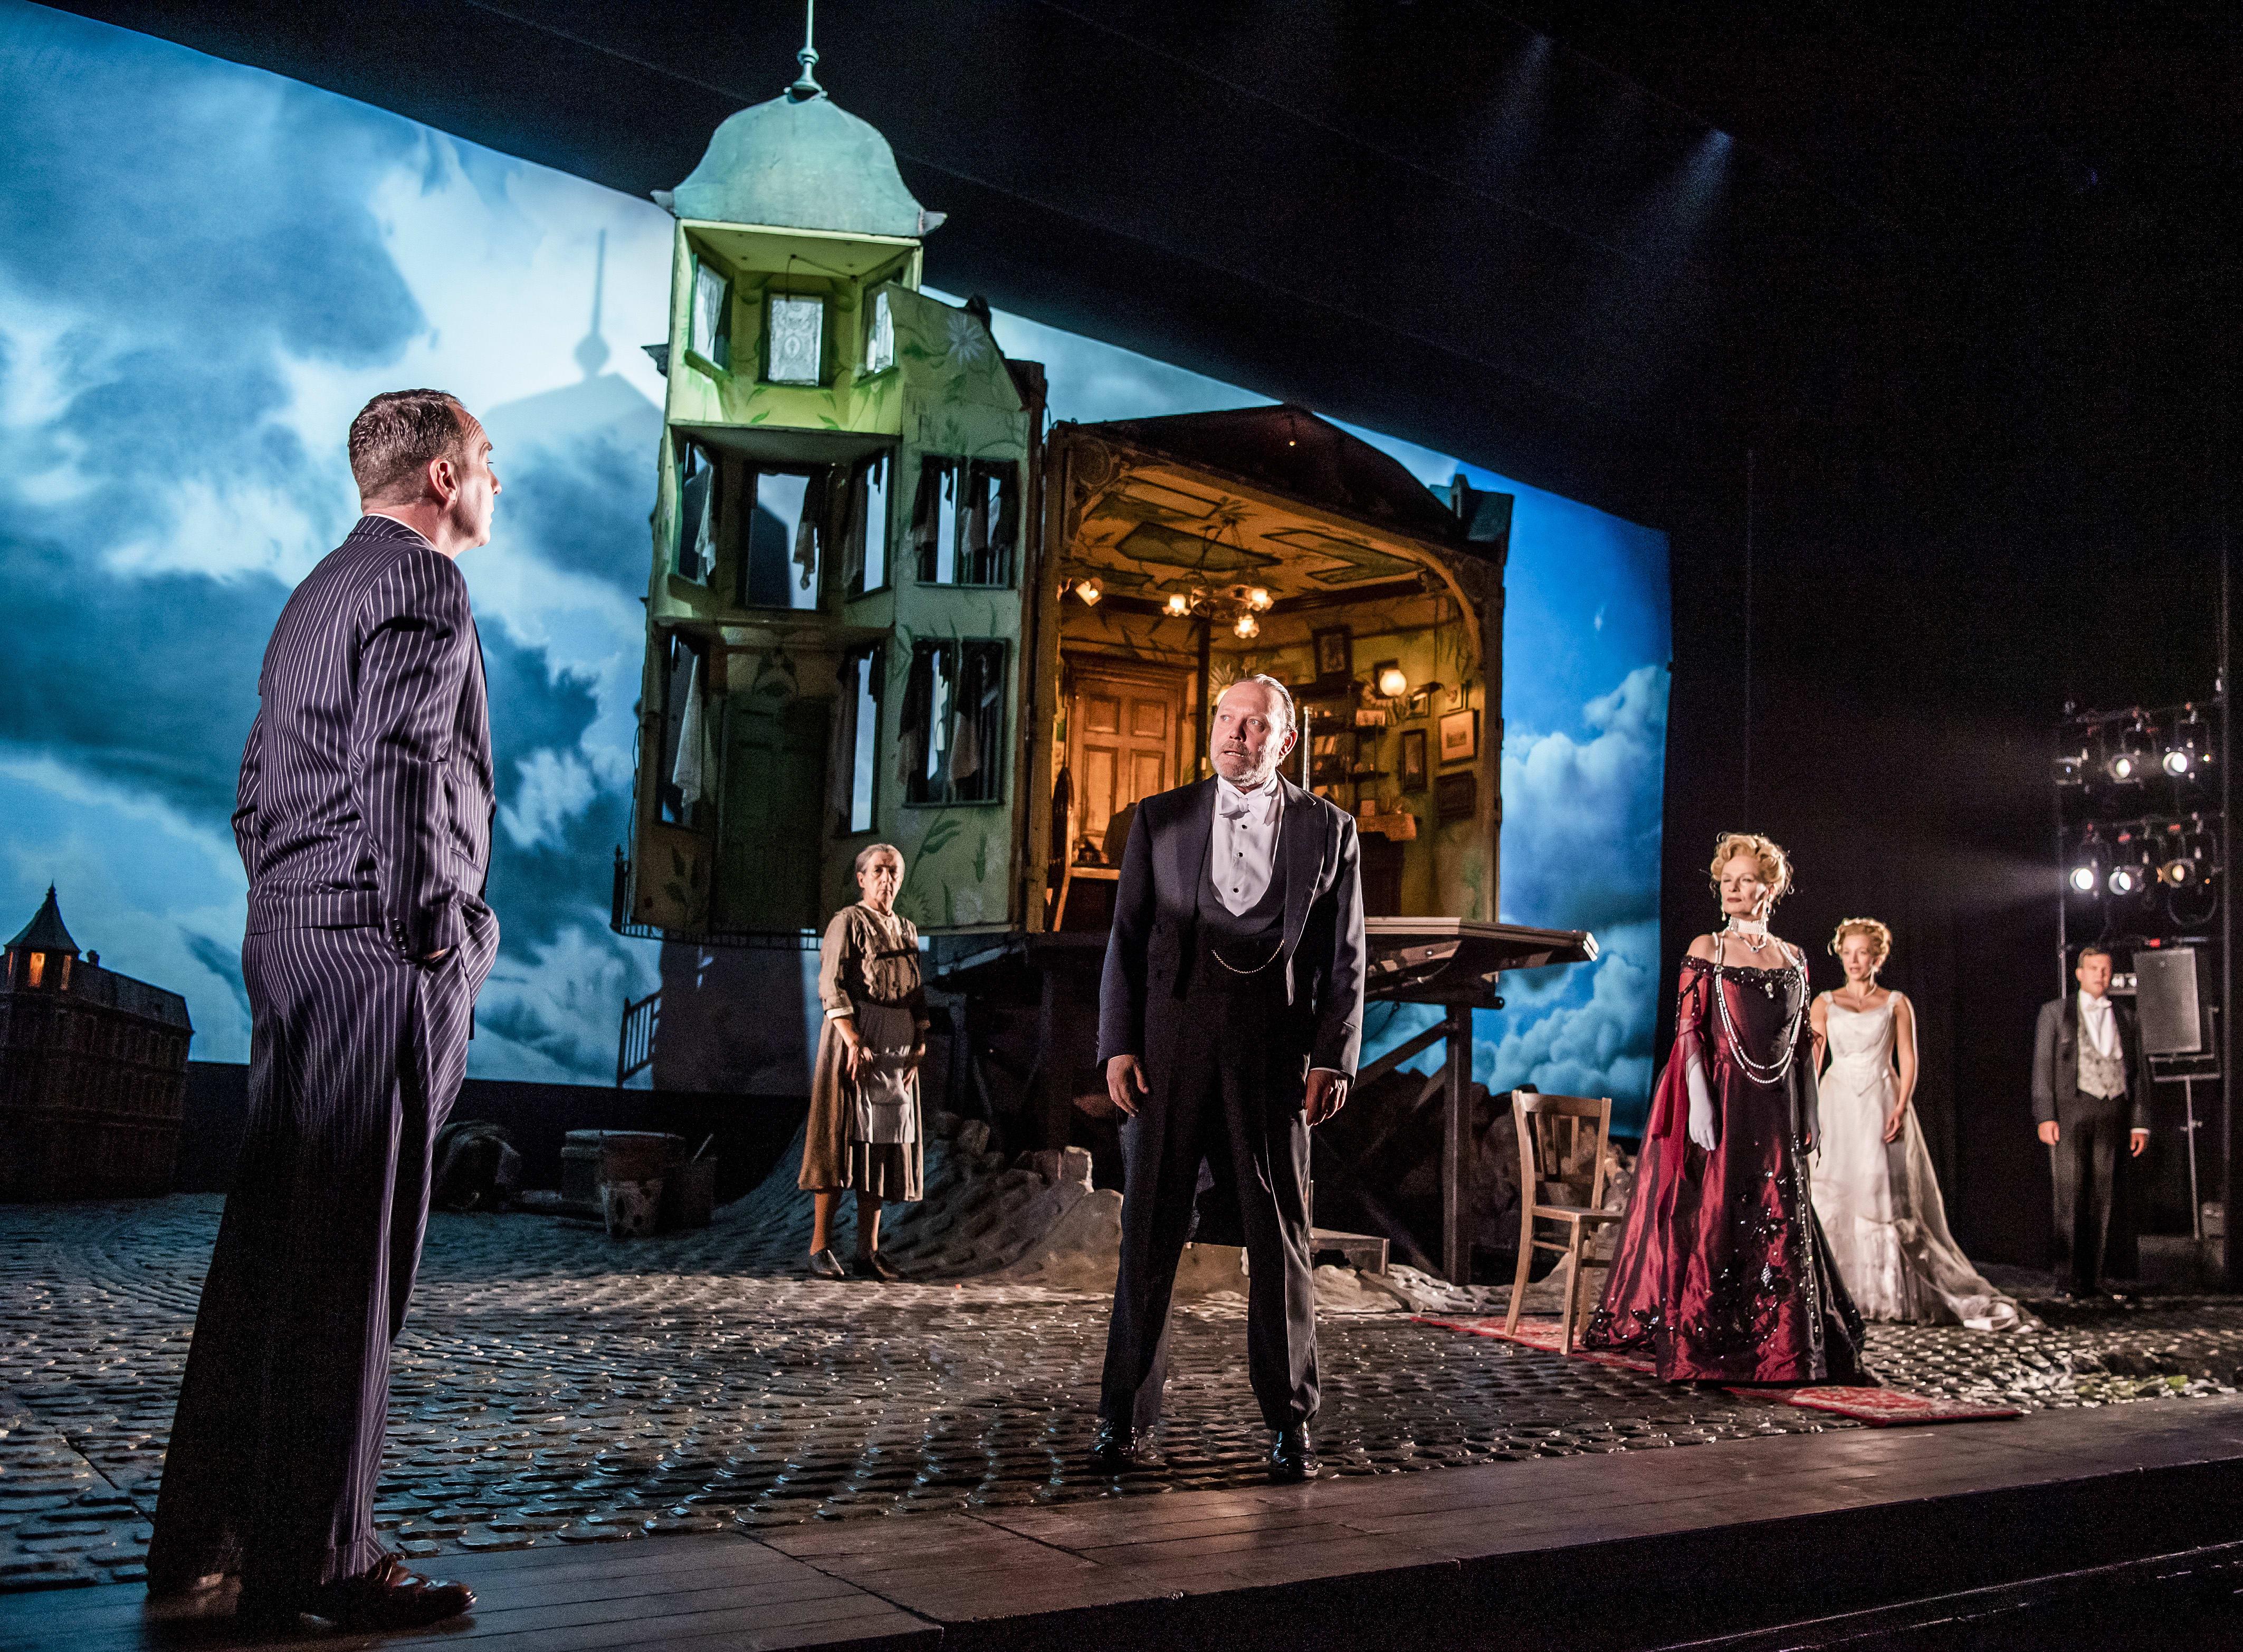 An Inspector Calls at New Wimbledon Theatre